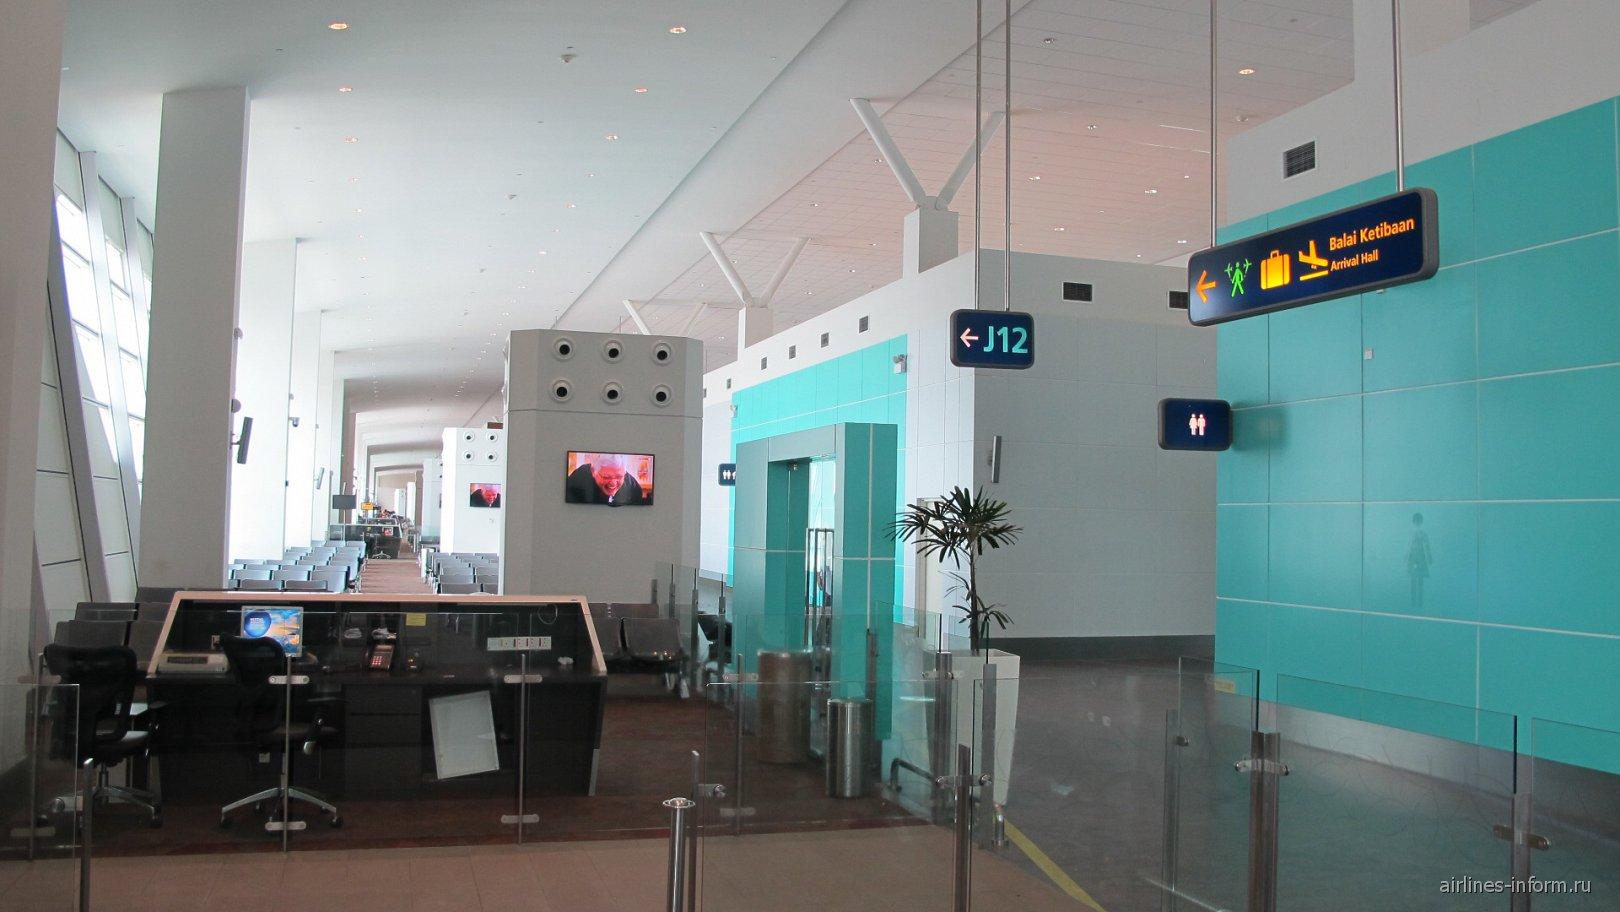 Выход на посадку в лоукост-терминале KLIA2 аэропорта Куала-Лумпур